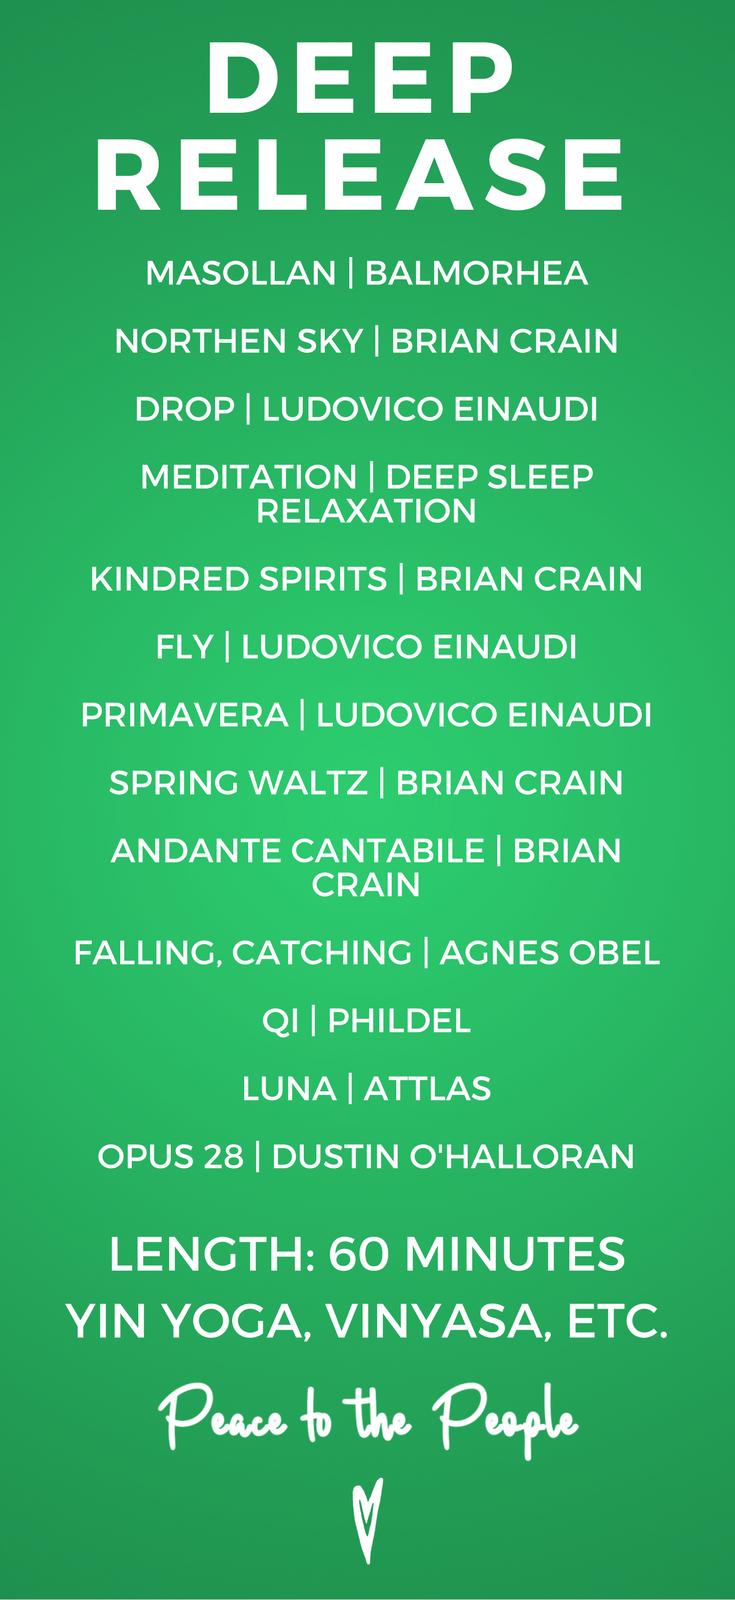 Deep Release Yin Yoga | 60 Minute Relaxing Vinyasa Playlist